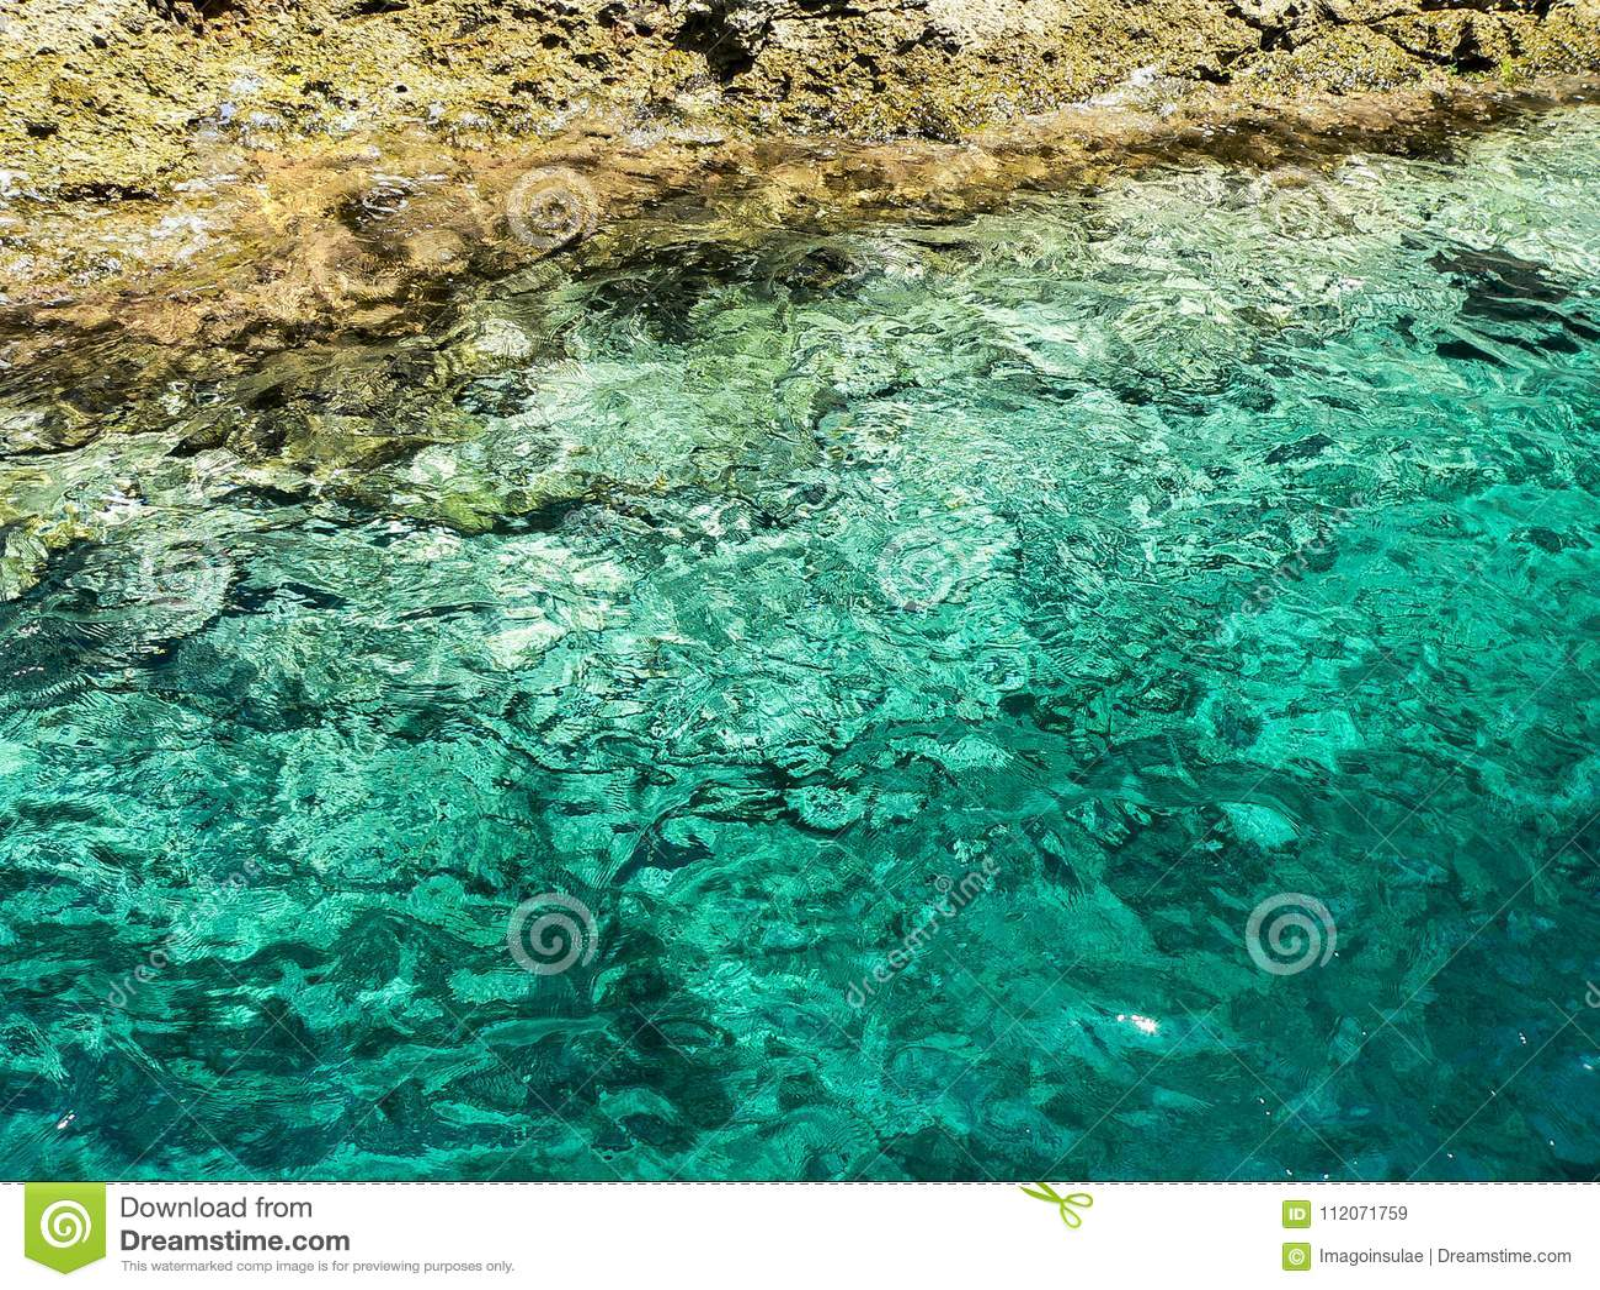 Environment. Water. Ocean